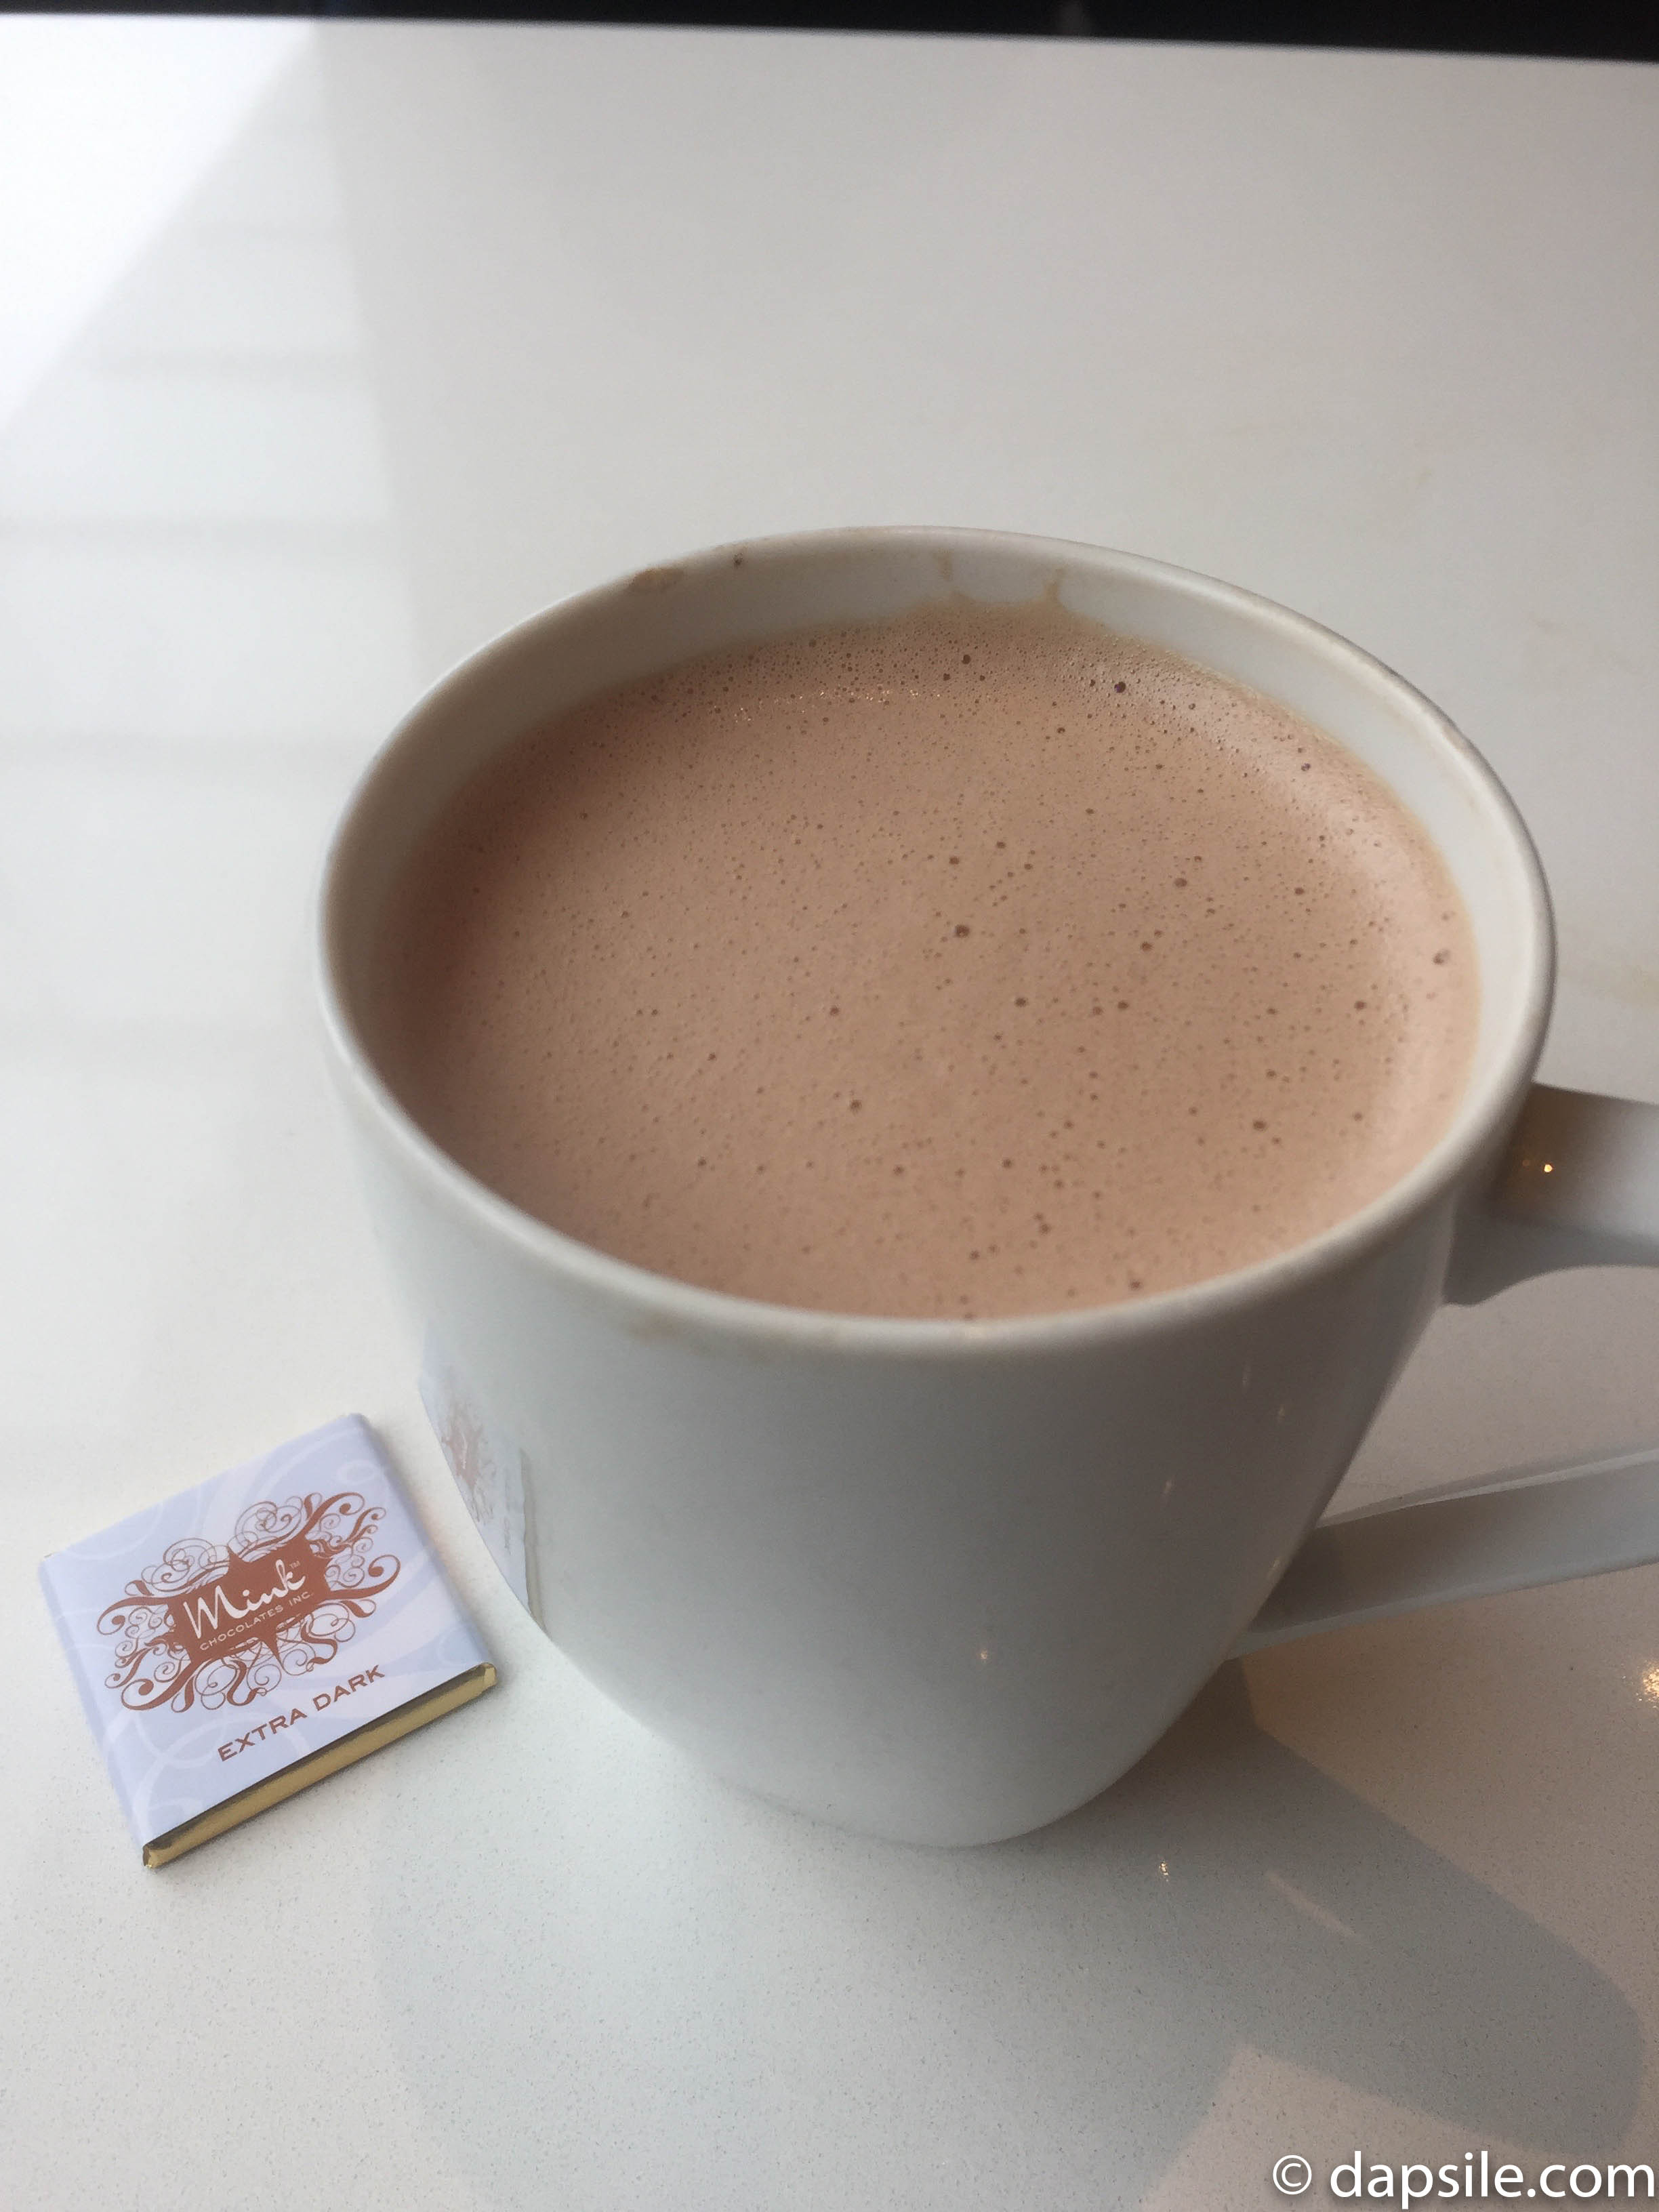 Mink Chocolates Dark Hot Chocolate with Small Dark Chocolate Square